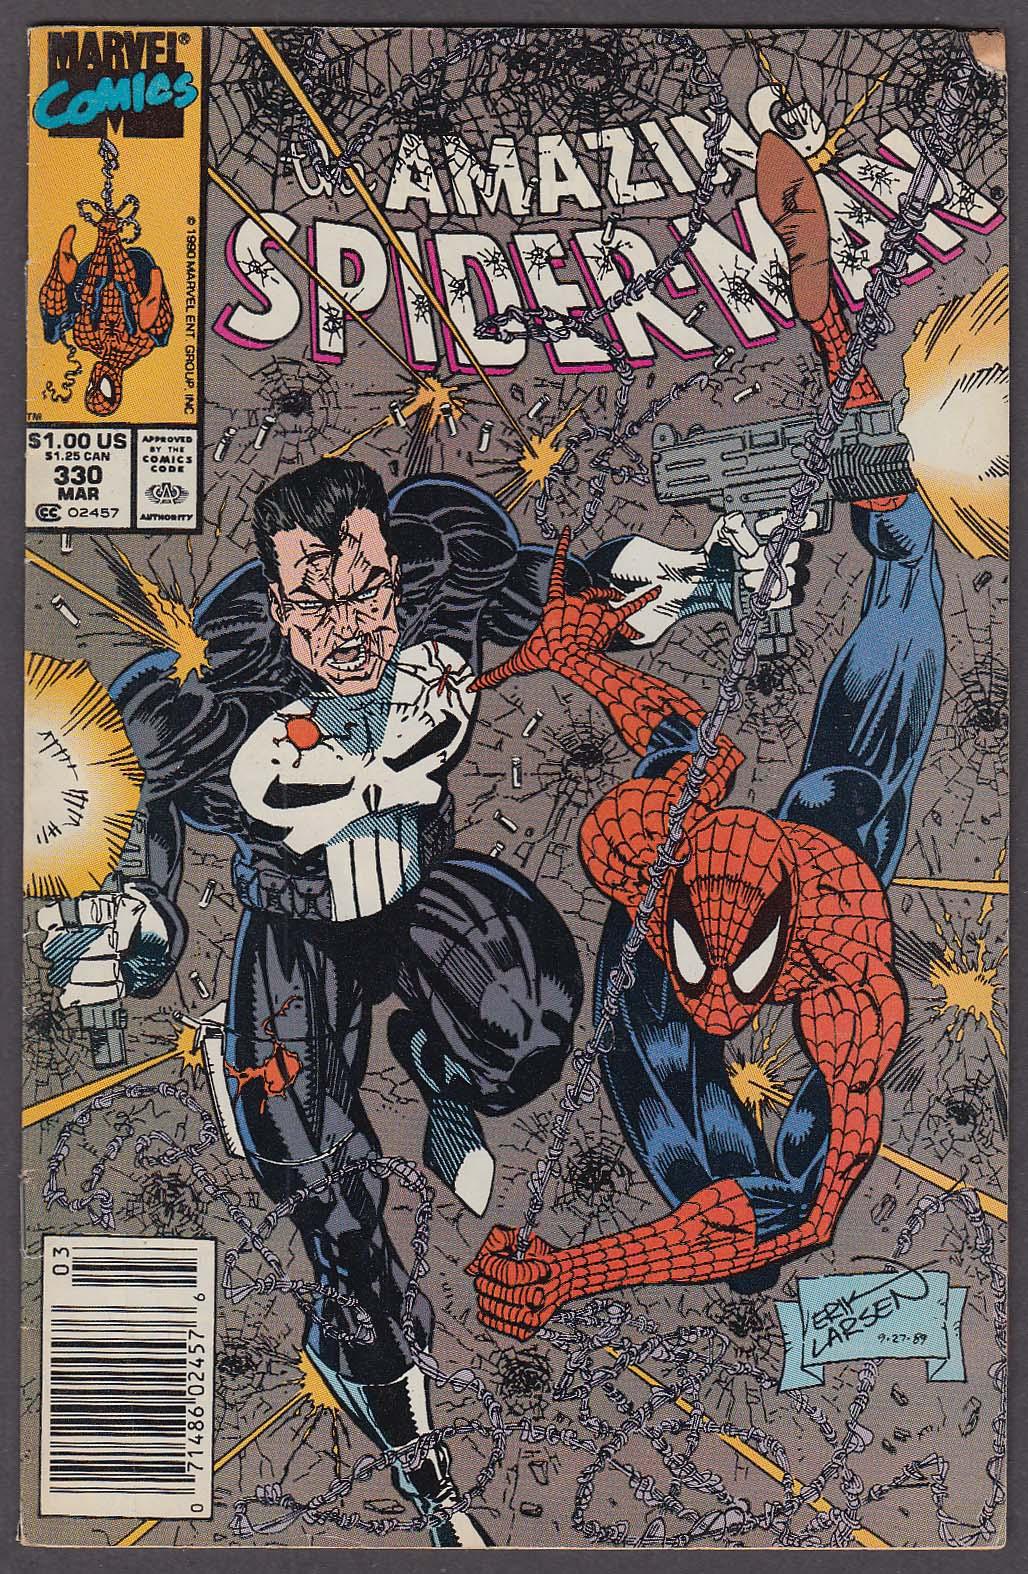 AMAZING SPIDER-MAN #330 Marvel comic book 3 1990 Punisher